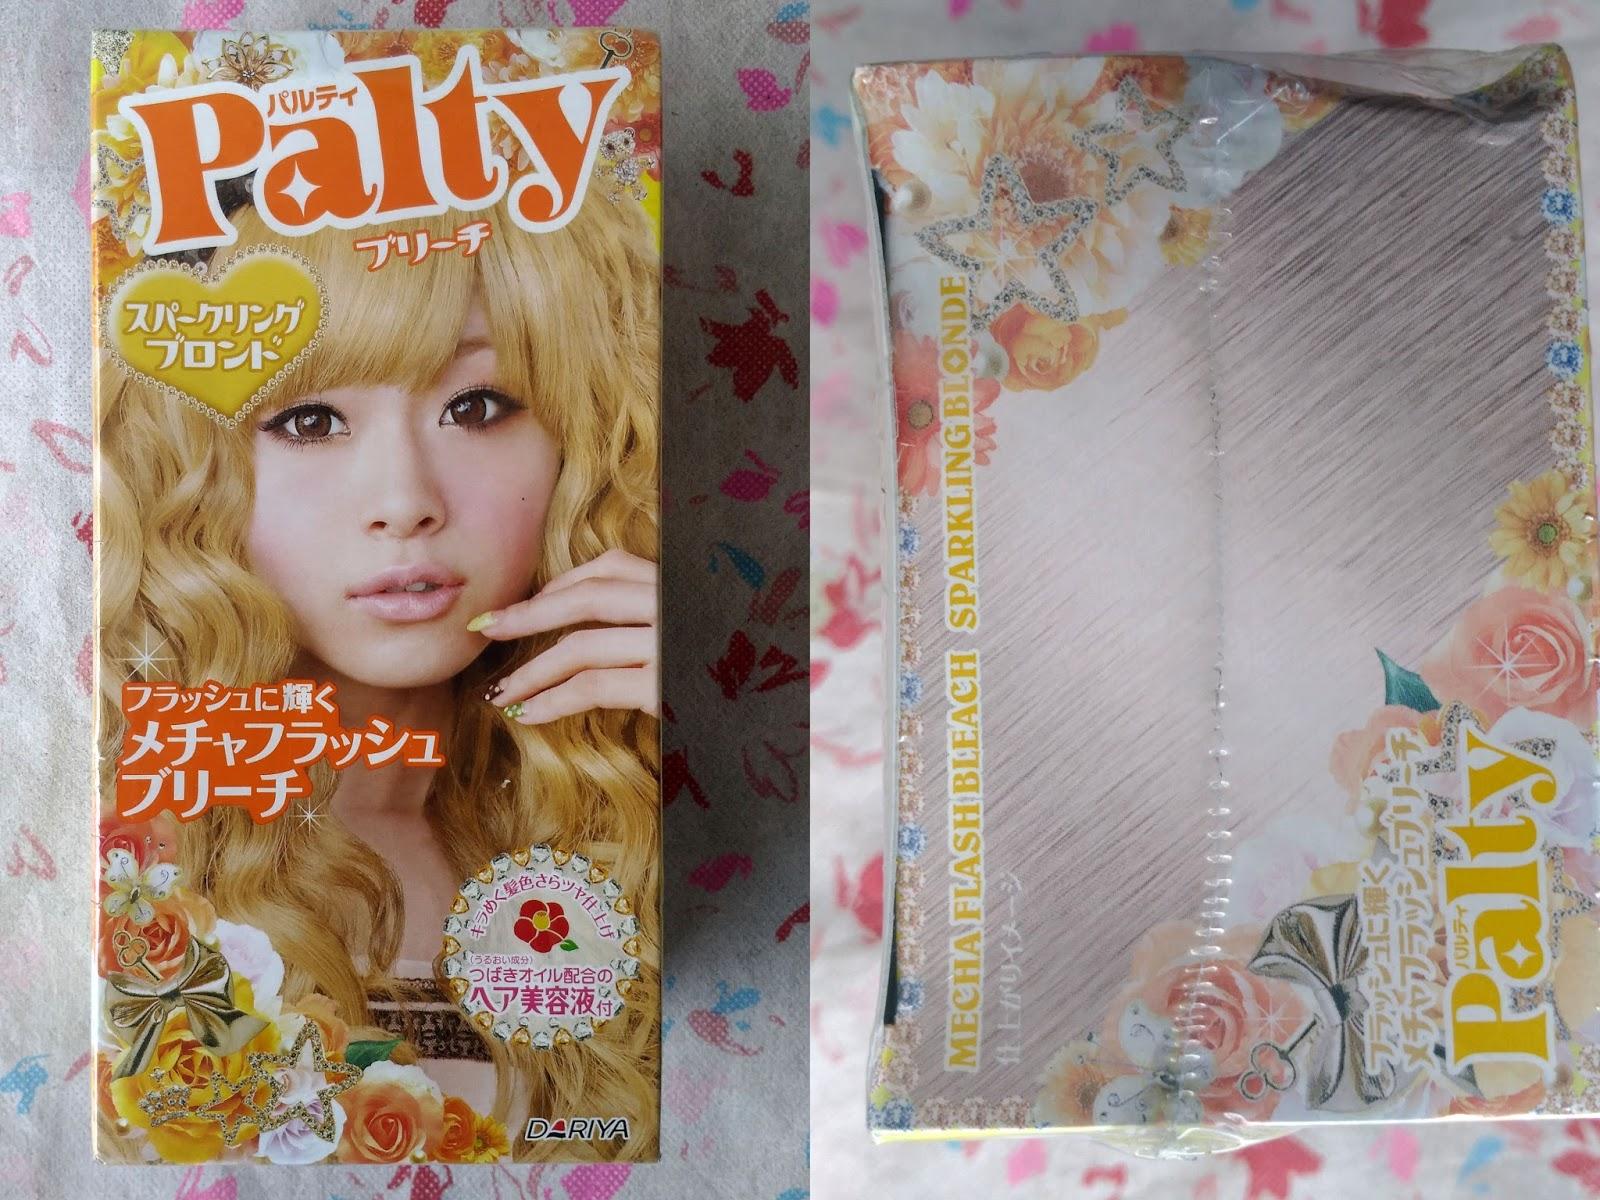 Piaya Diary Hair Bleaching Fail Now It Is Yellow